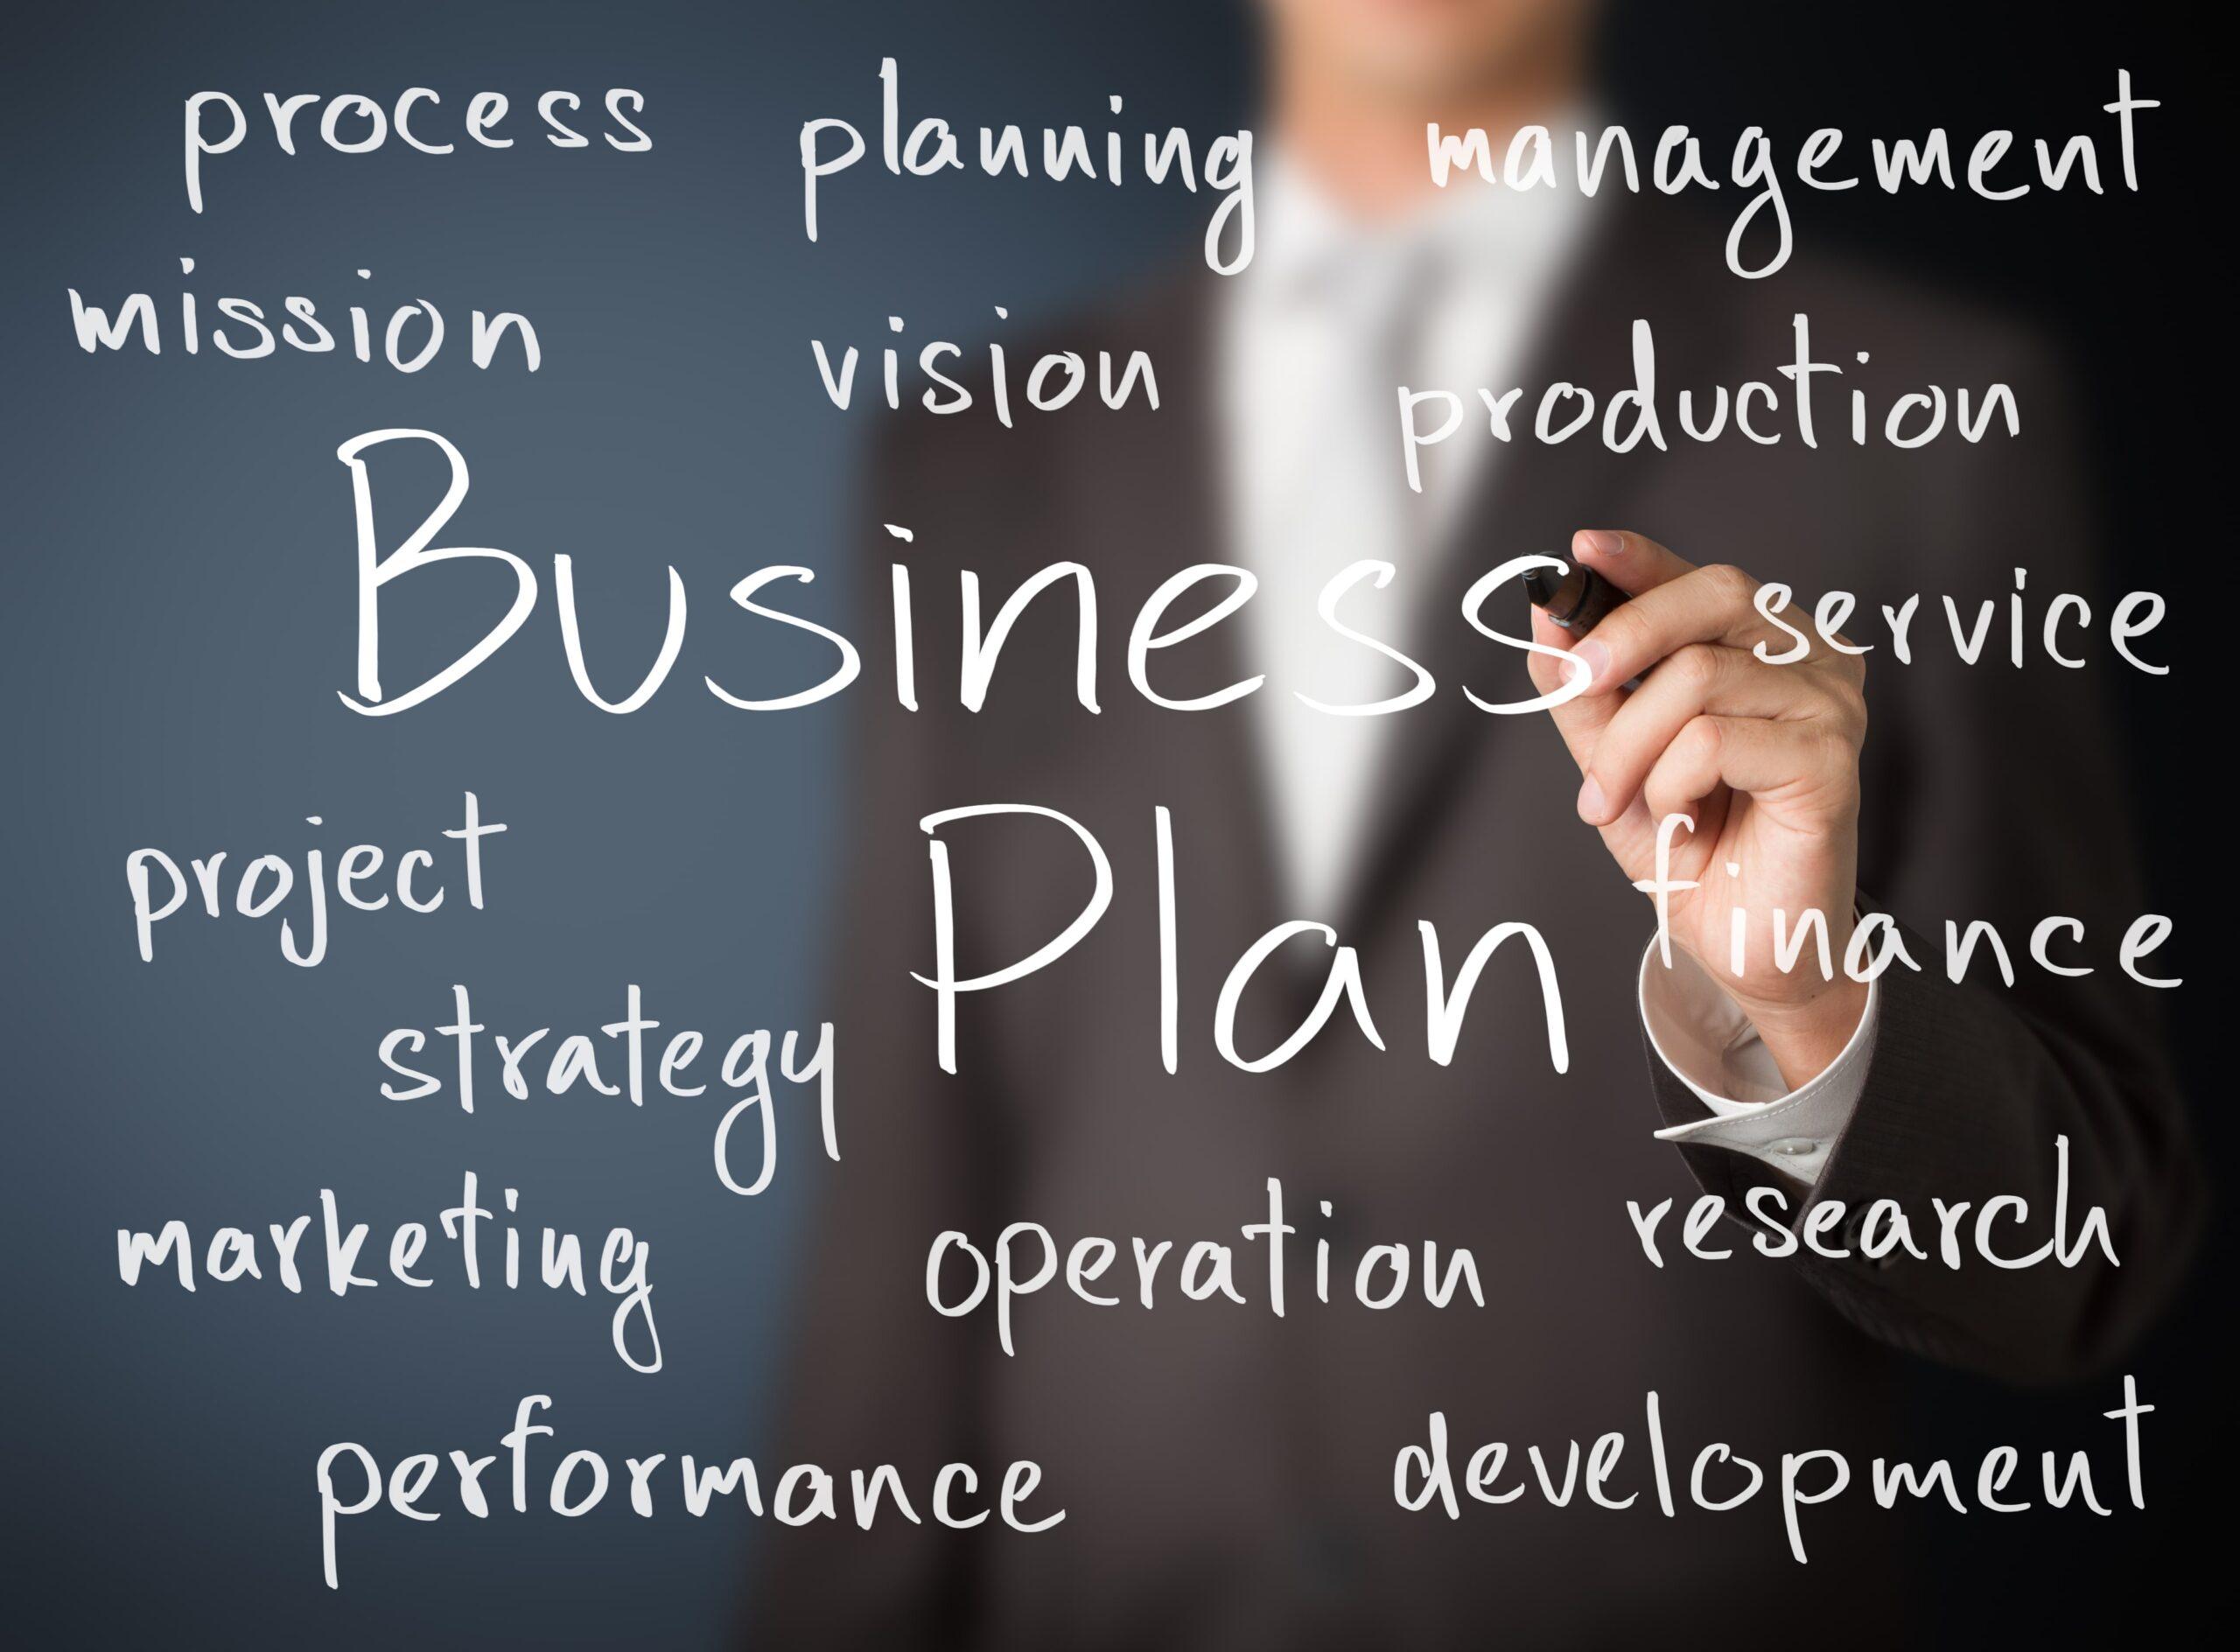 Realization business plan